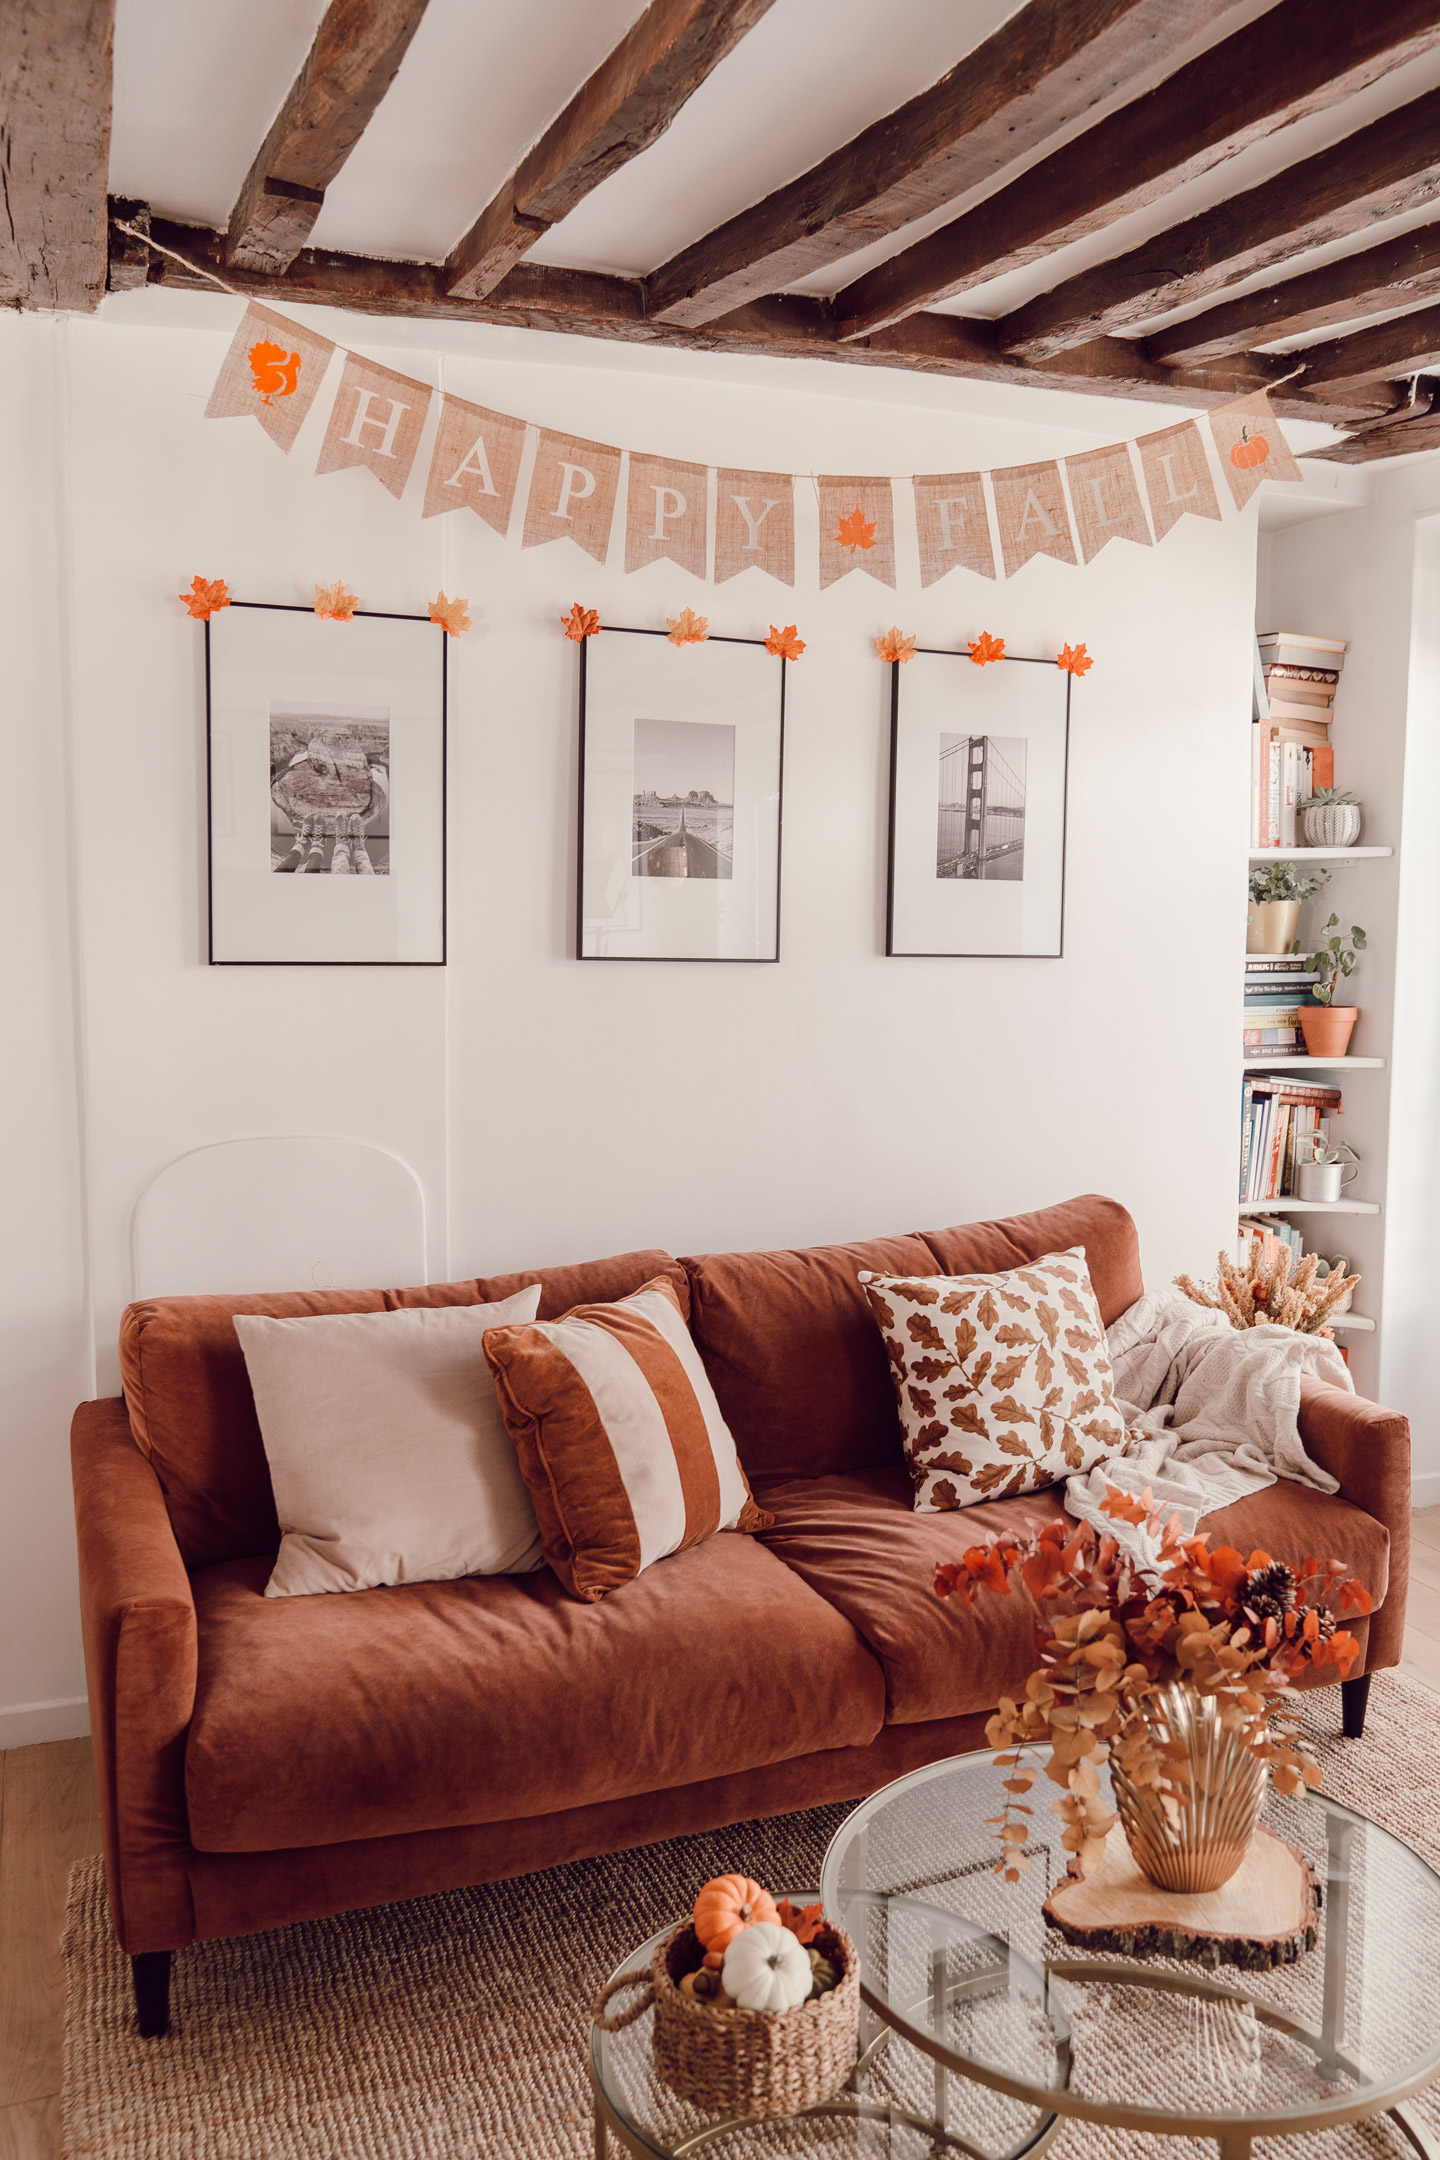 decoration-automne-03675-2